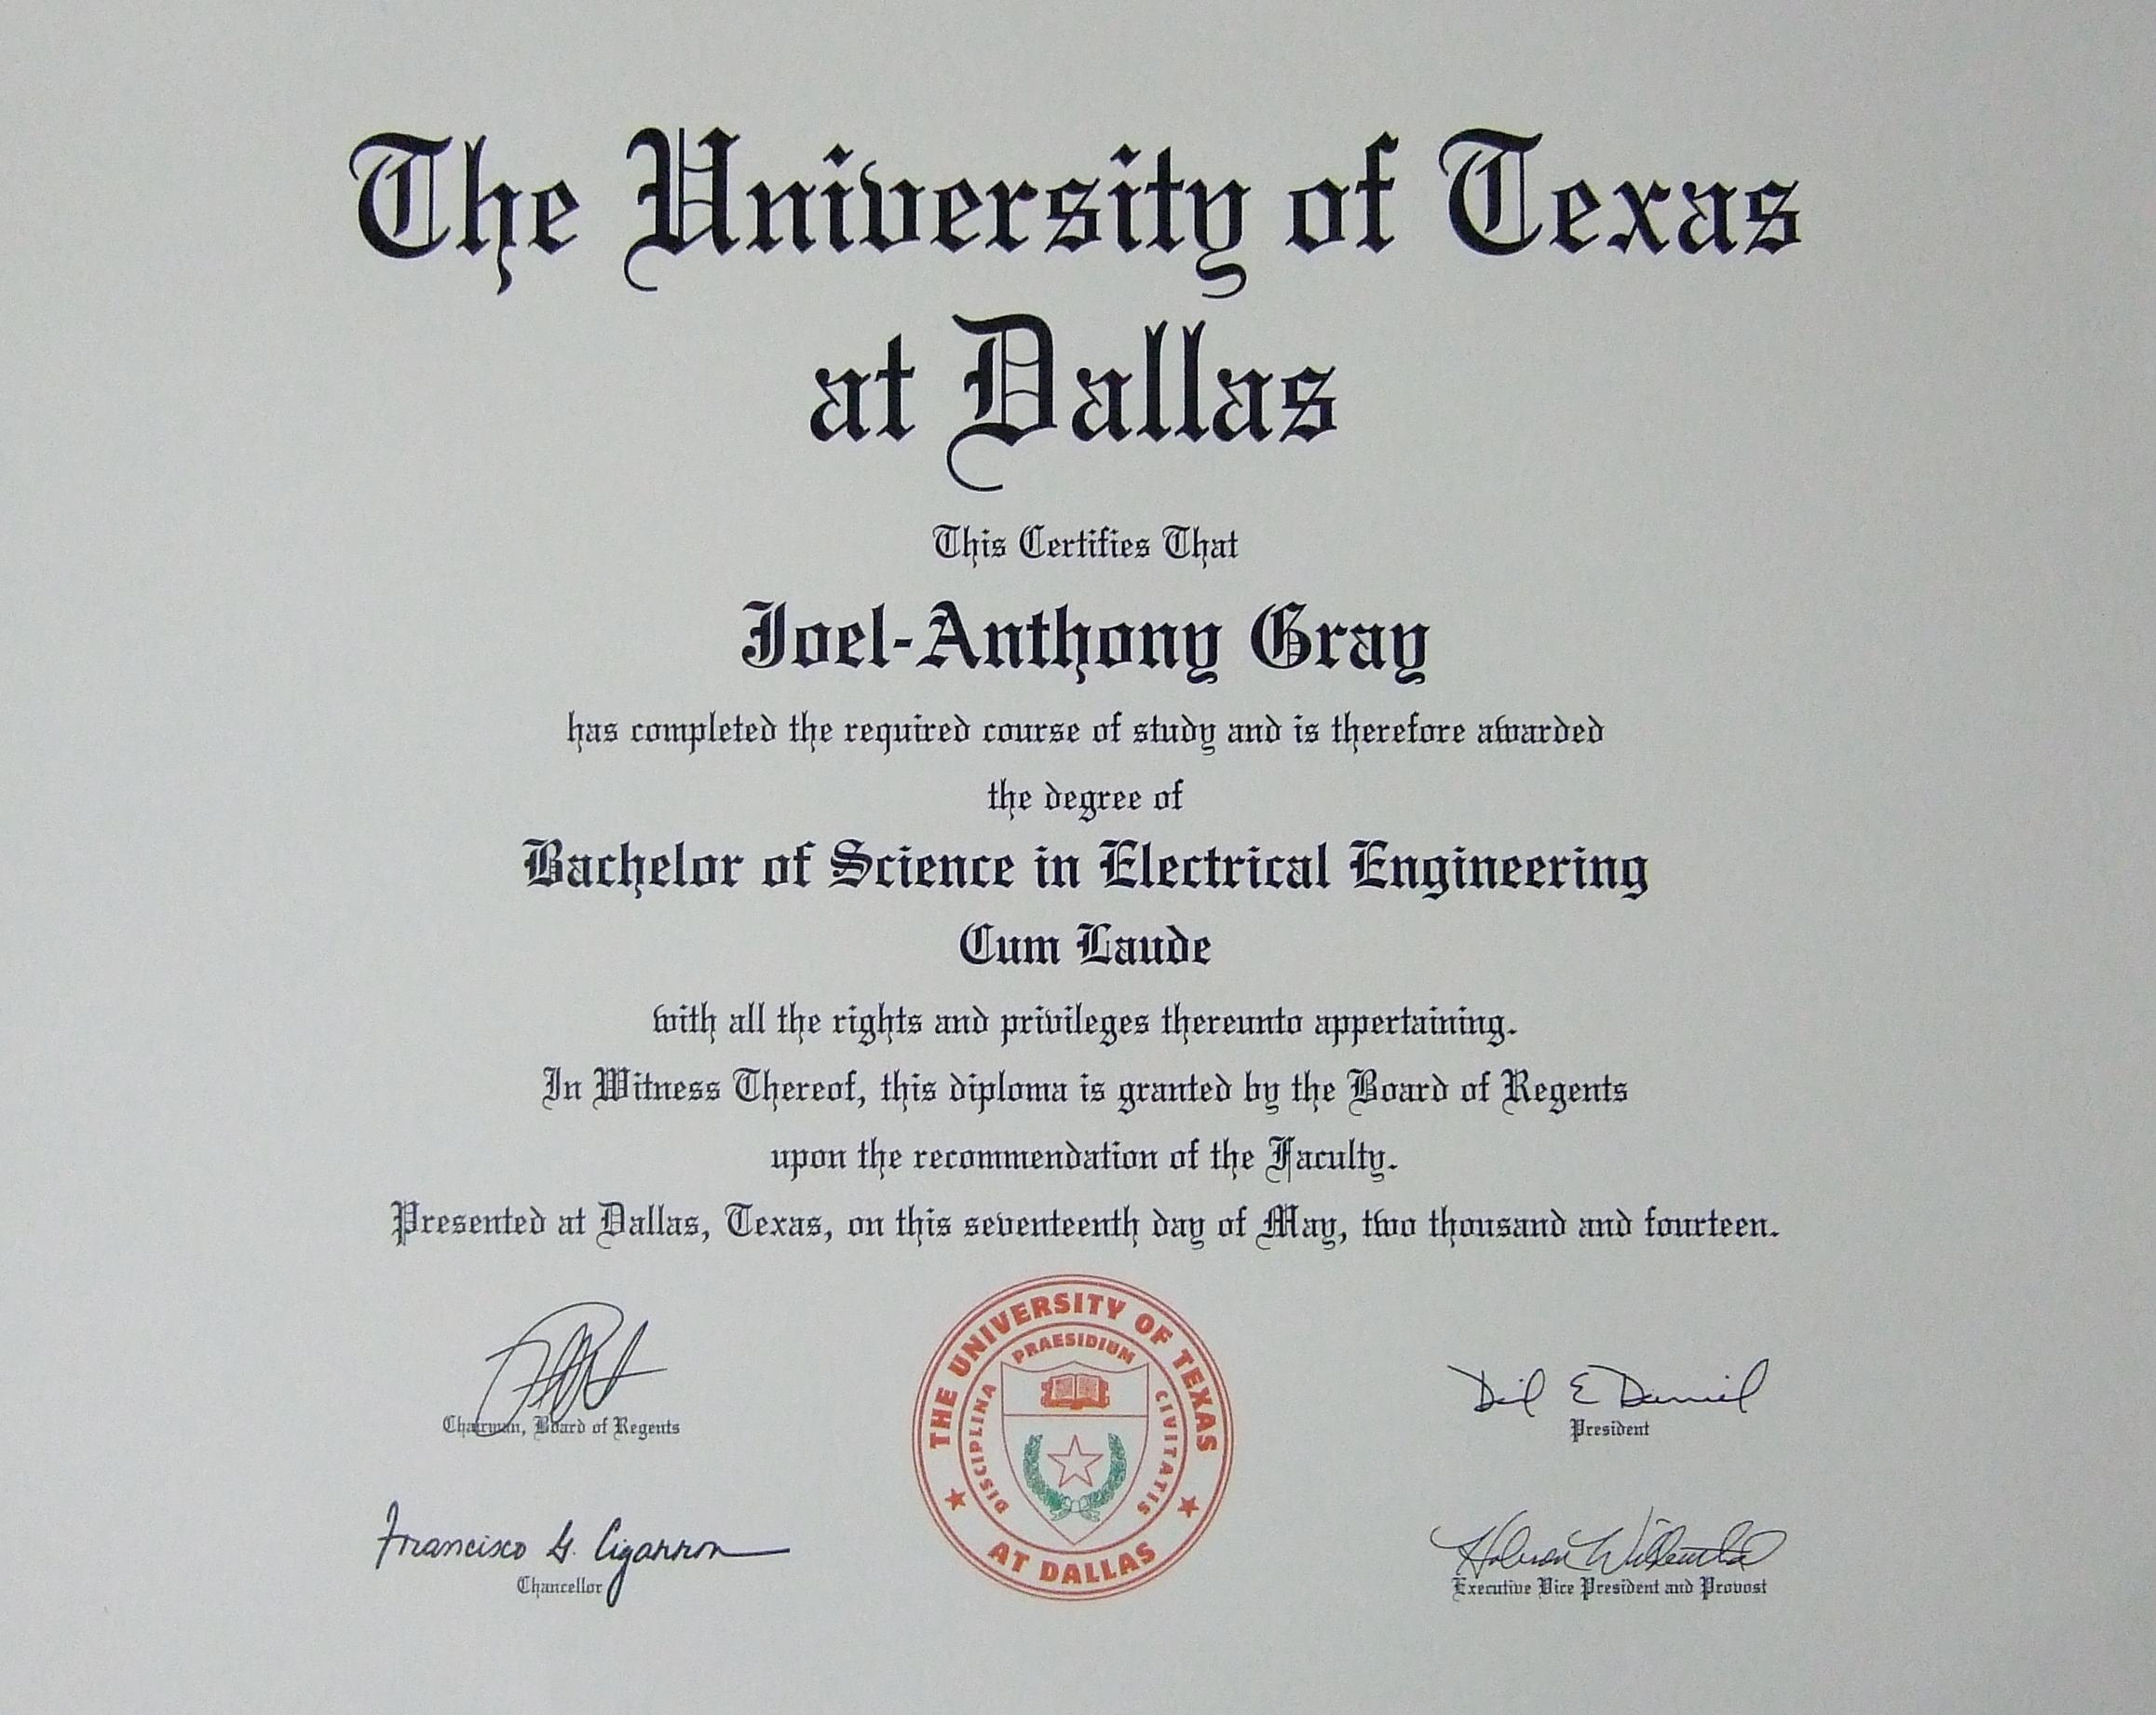 Joel-Anthony Gray BSEE Diploma Photo